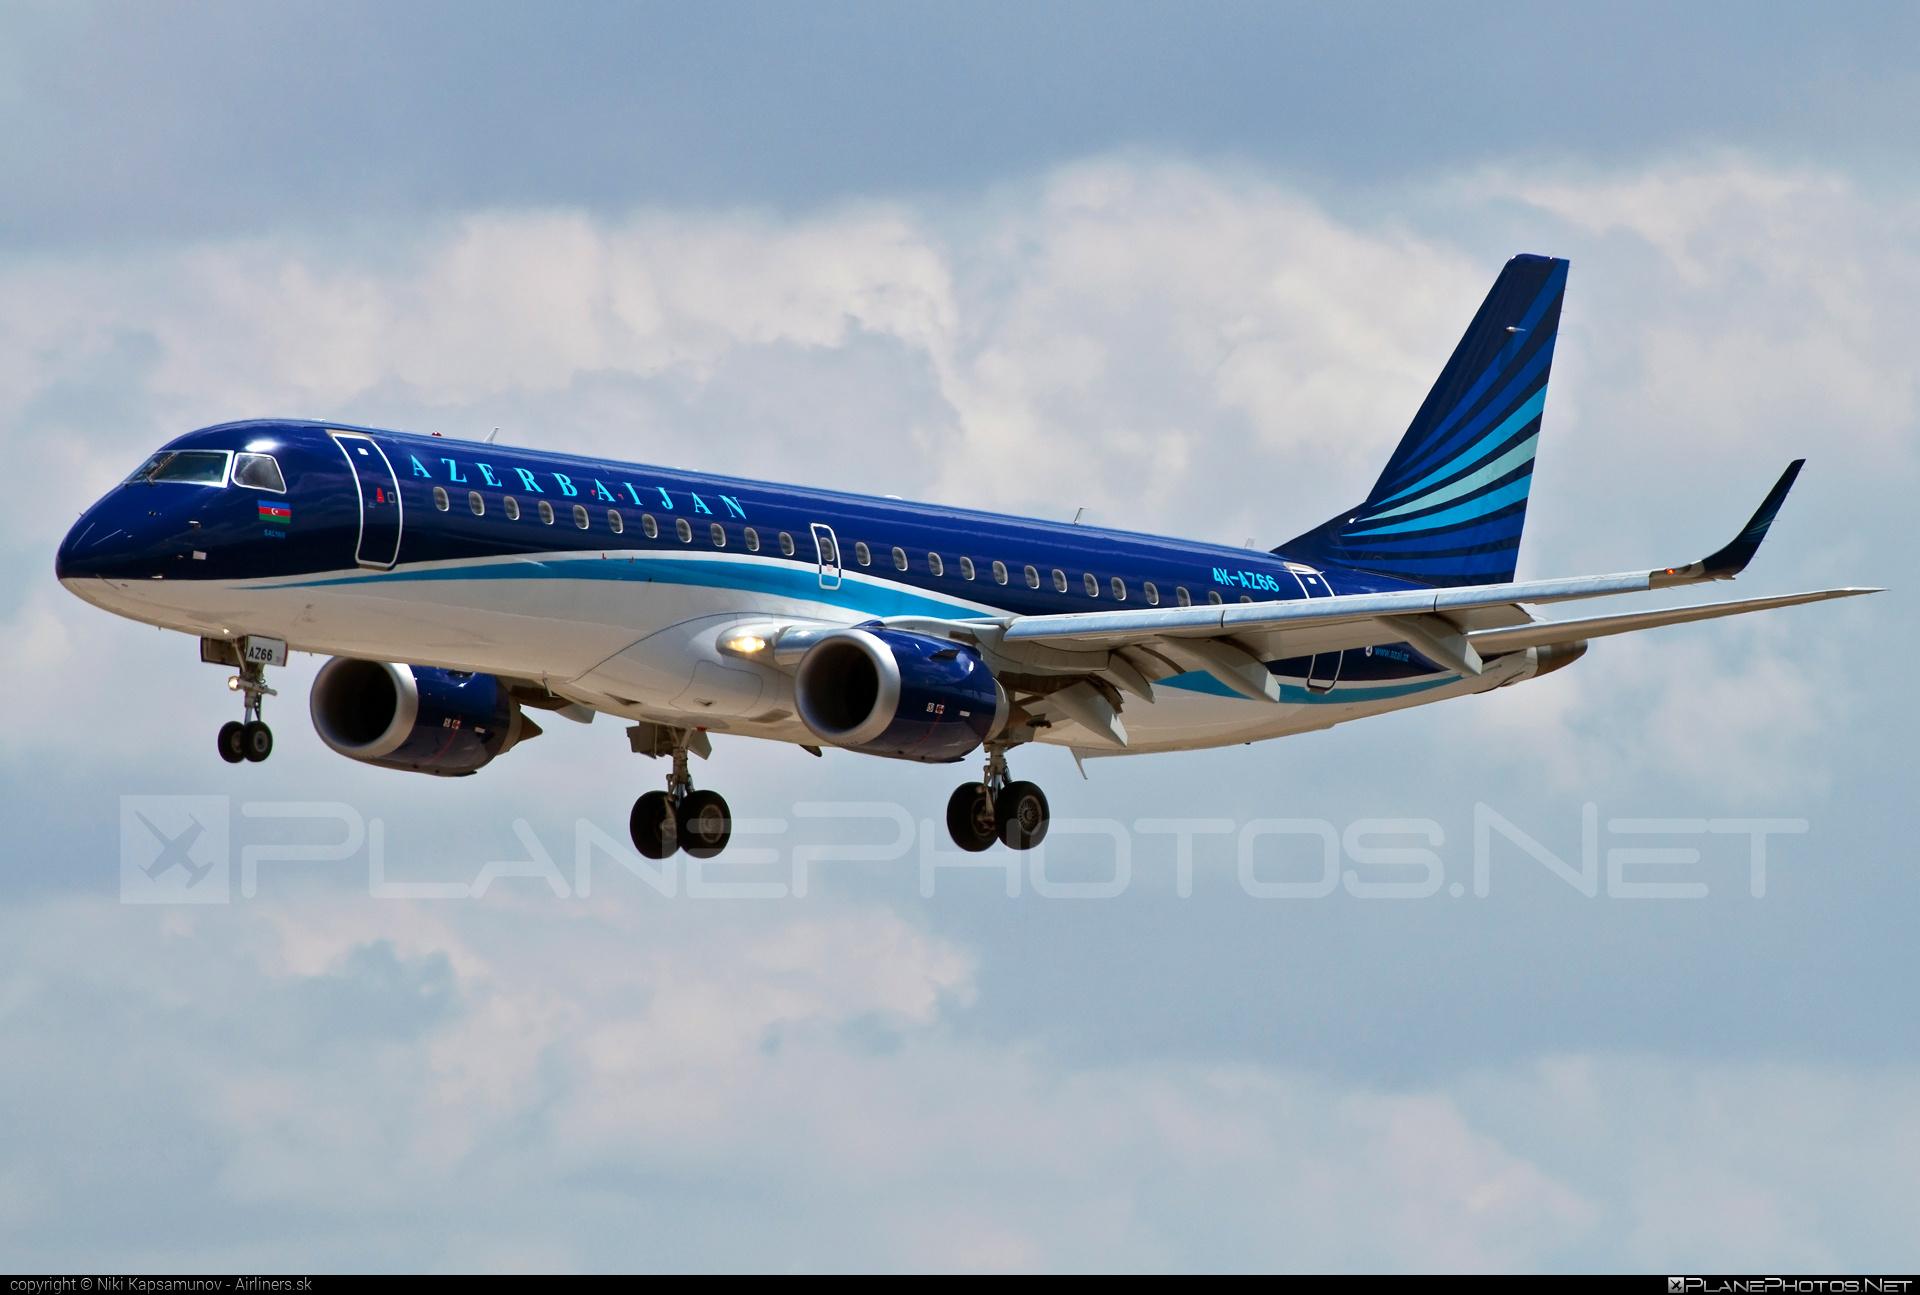 AZAL Azerbaijan Airlines Embraer 190-100IGW - 4K-AZ66 #e190 #embraer #embraer190 #embraer190igw